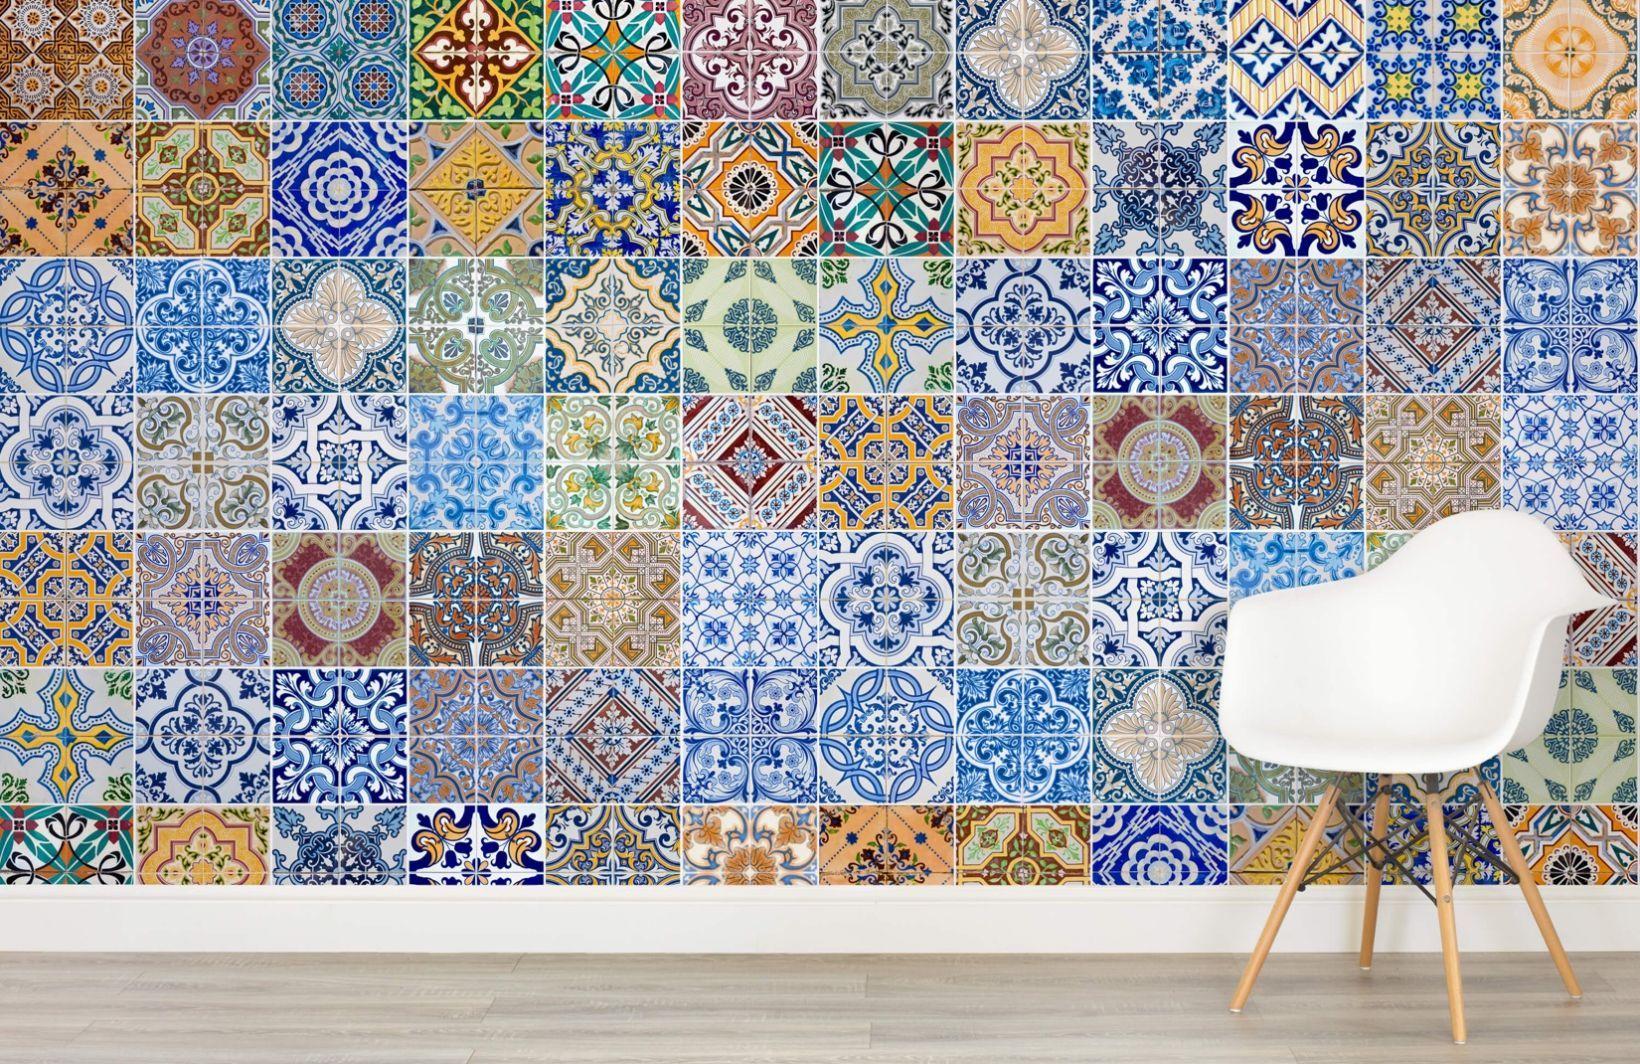 Patterned Tile Wallpaper Mural (With images) Tile